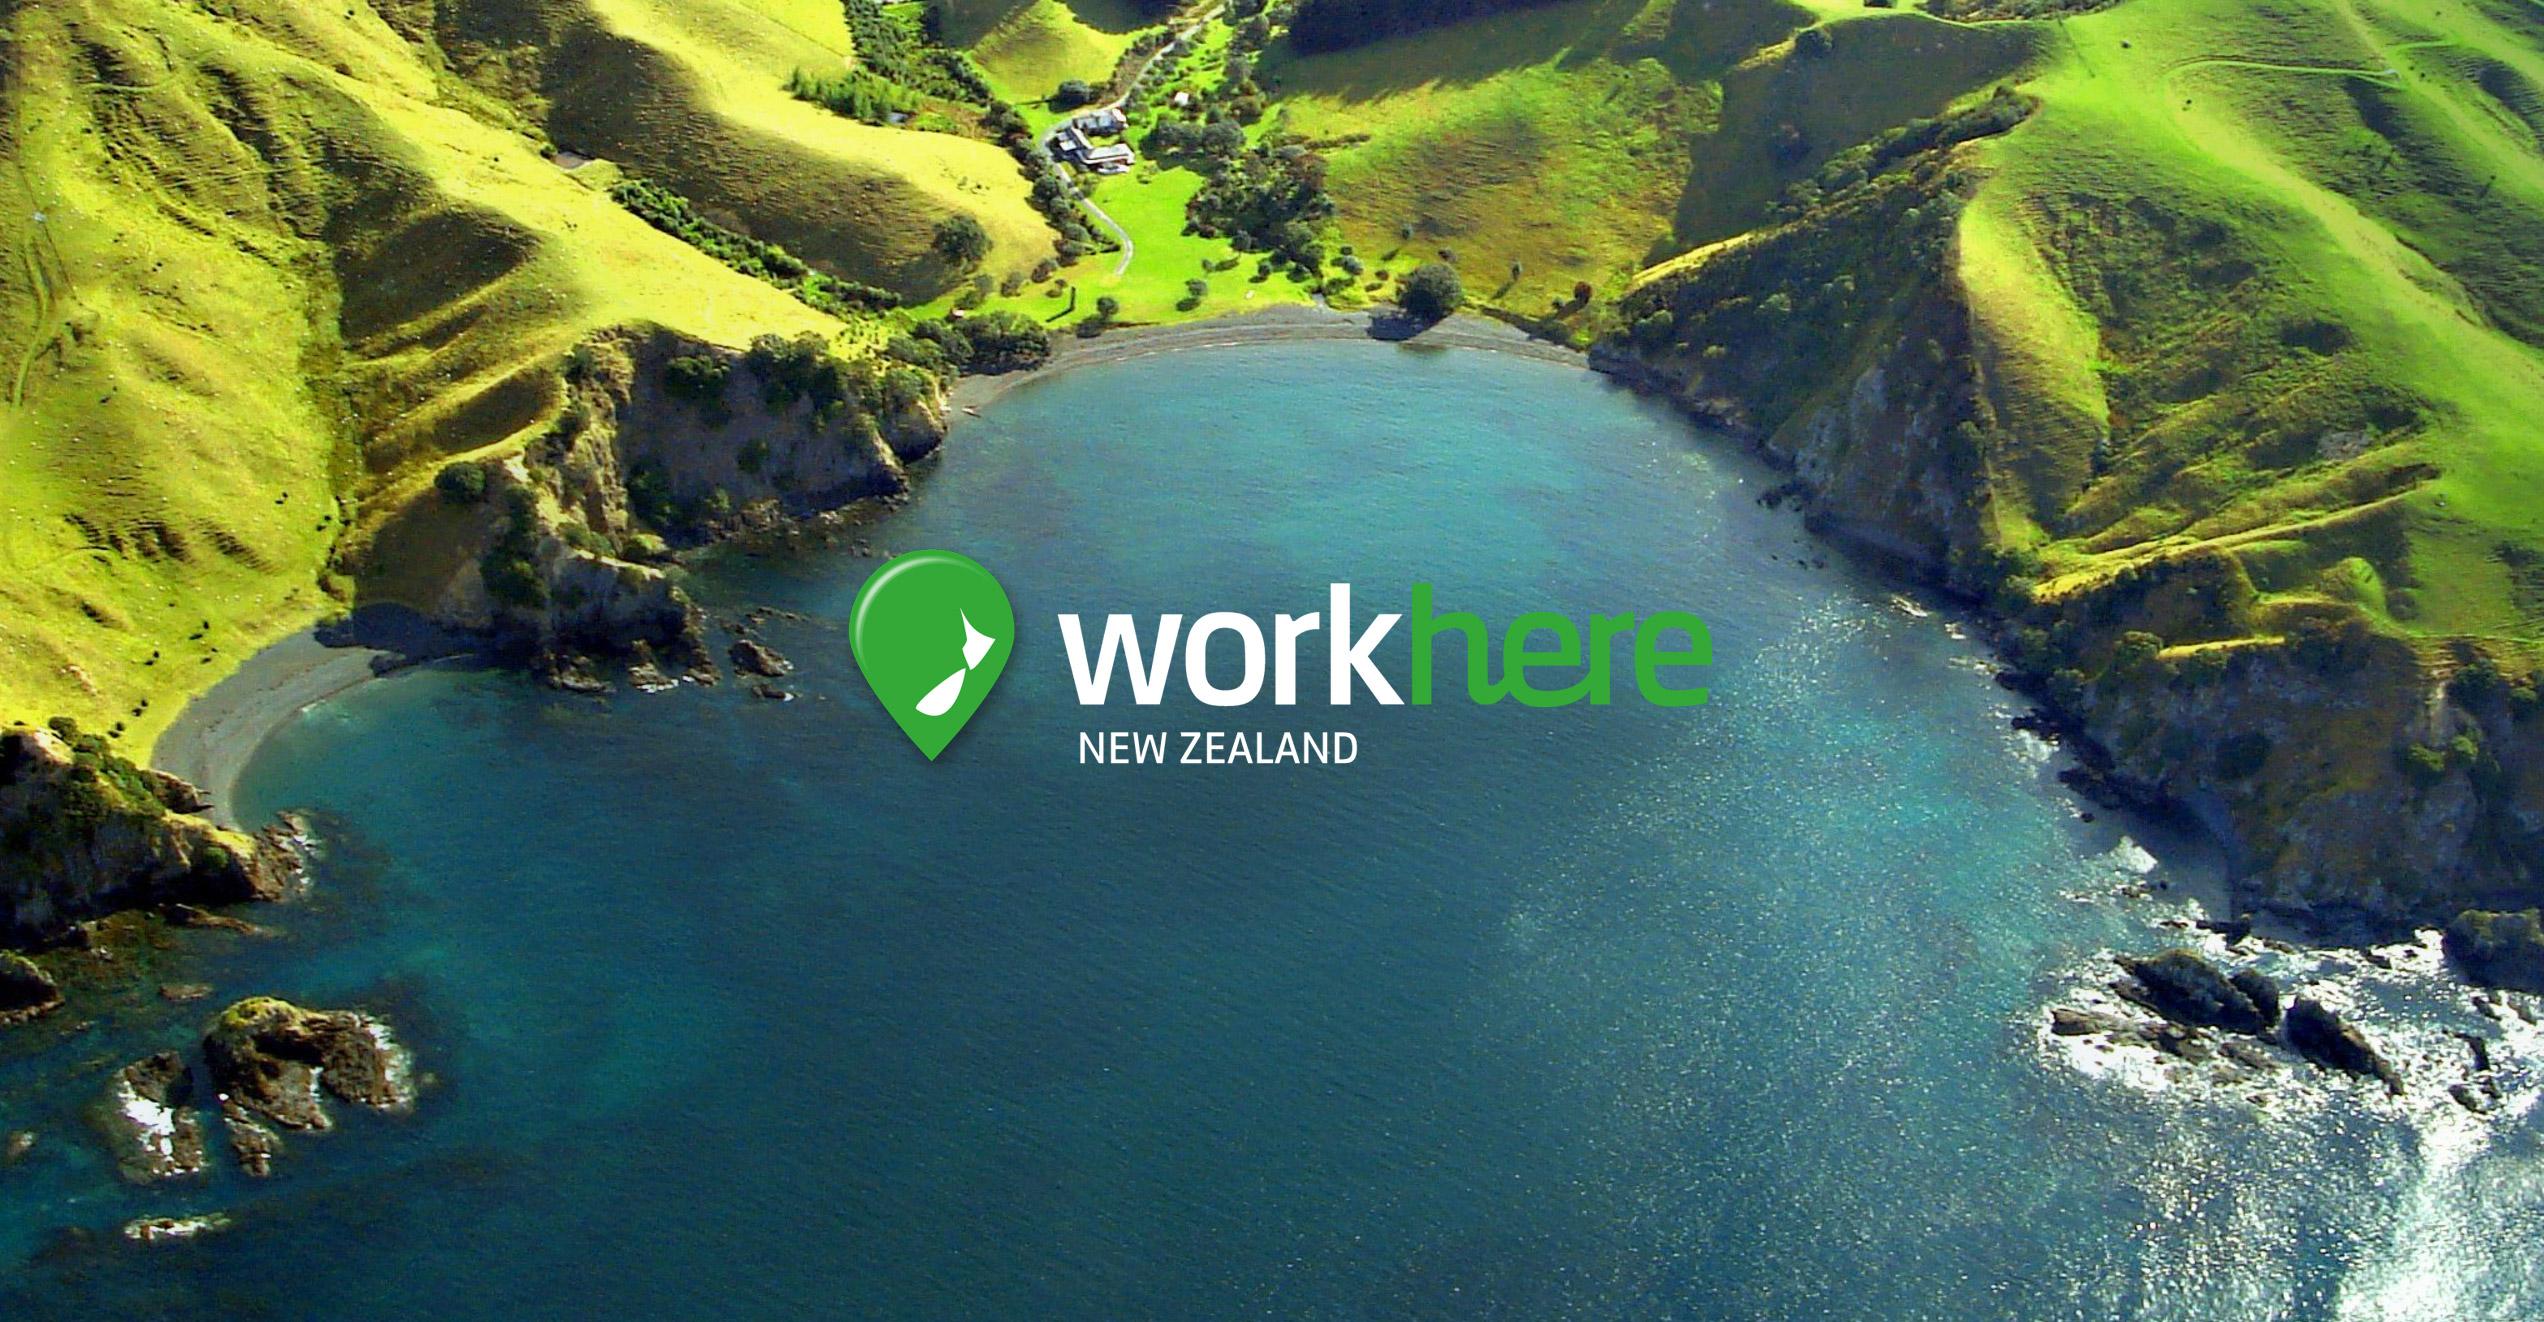 workhere_branding_hero.jpg